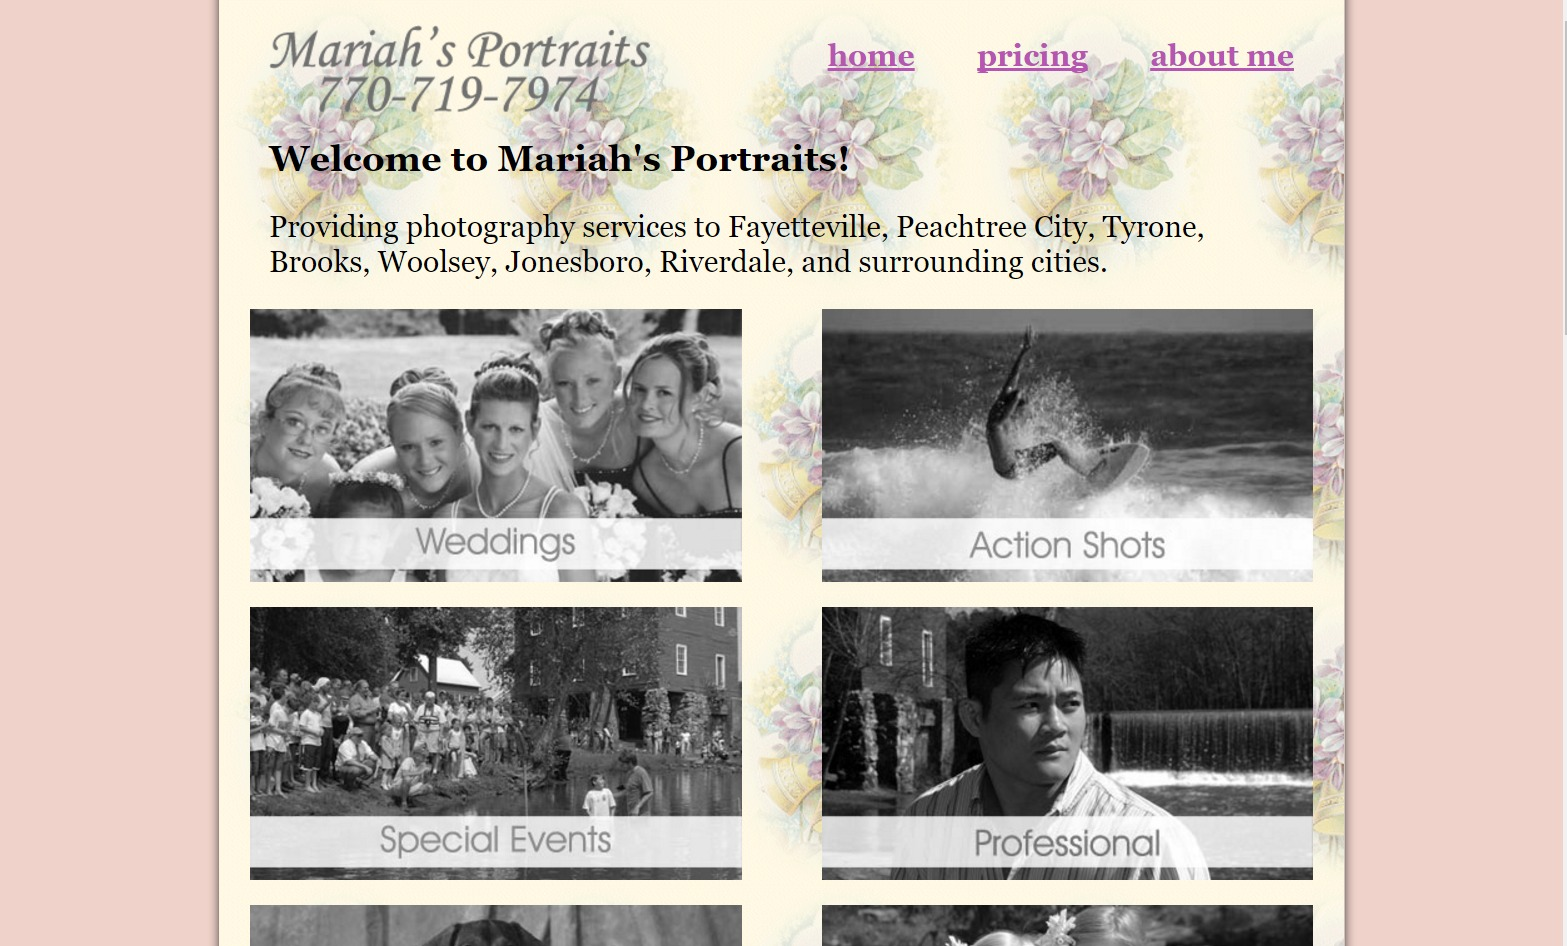 Mariah's Portraits (Fayetteville, GA) Web Design Project